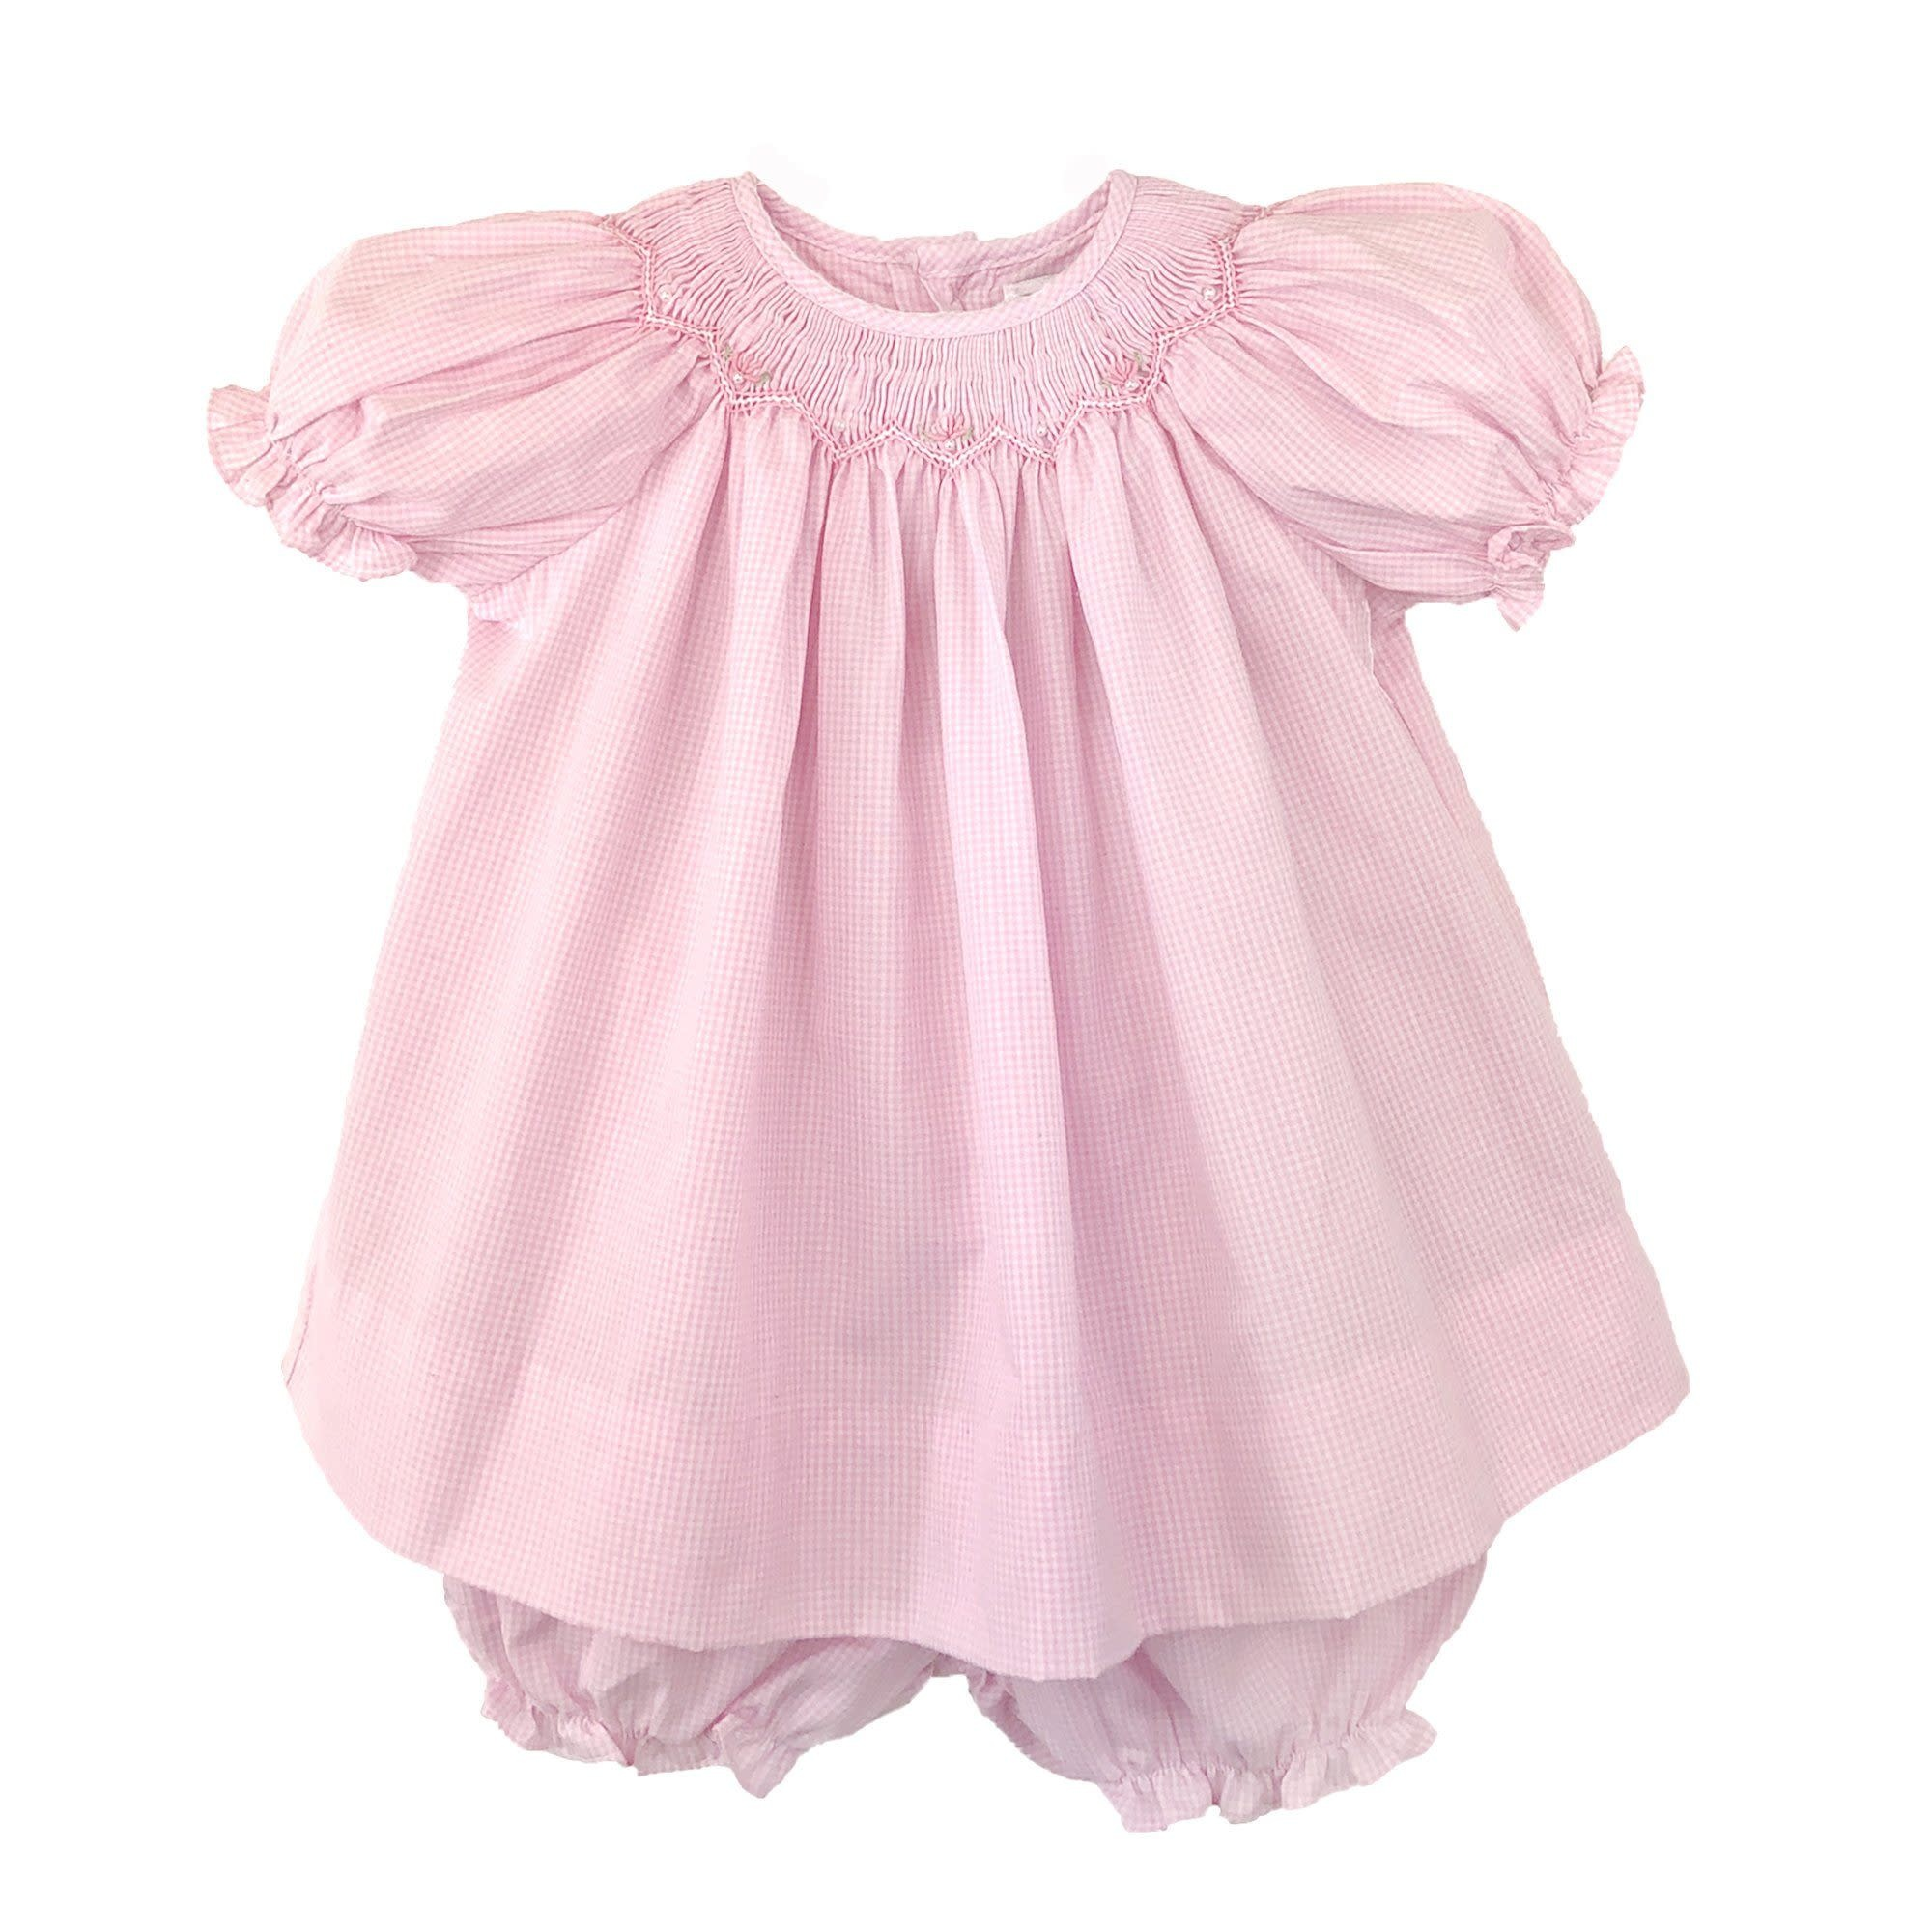 Renzo Bishop Zig Zag Smocked Dress New Born